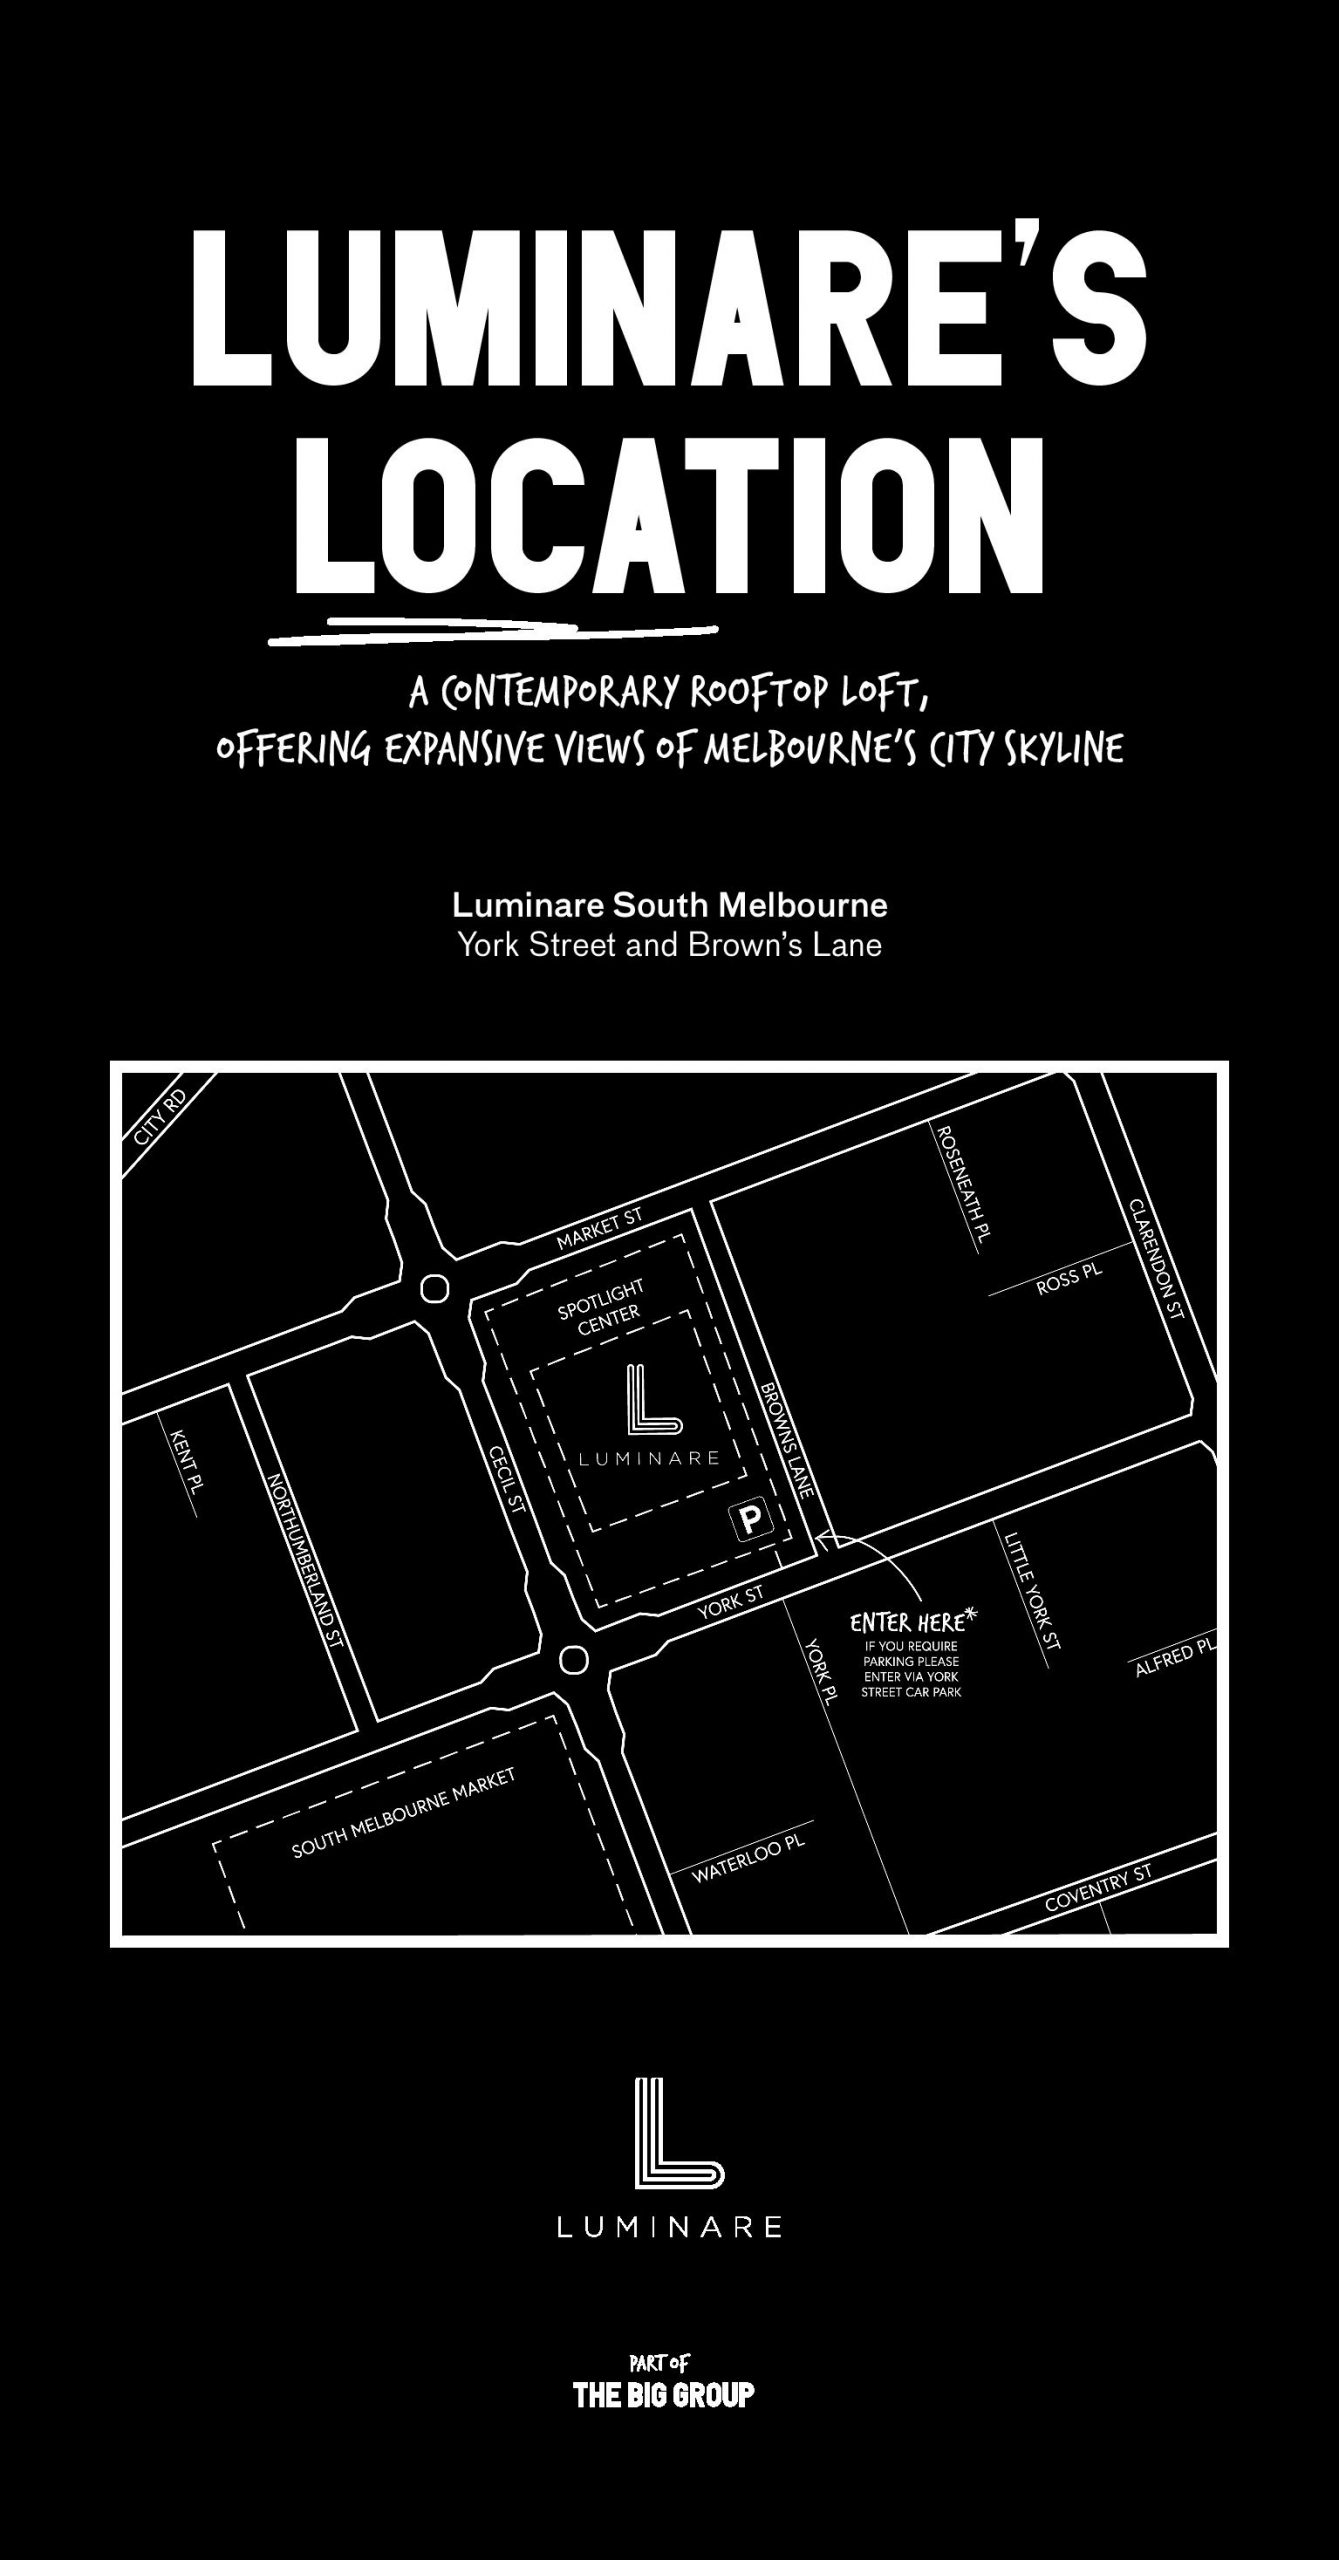 lum-location-map-edm-page-001